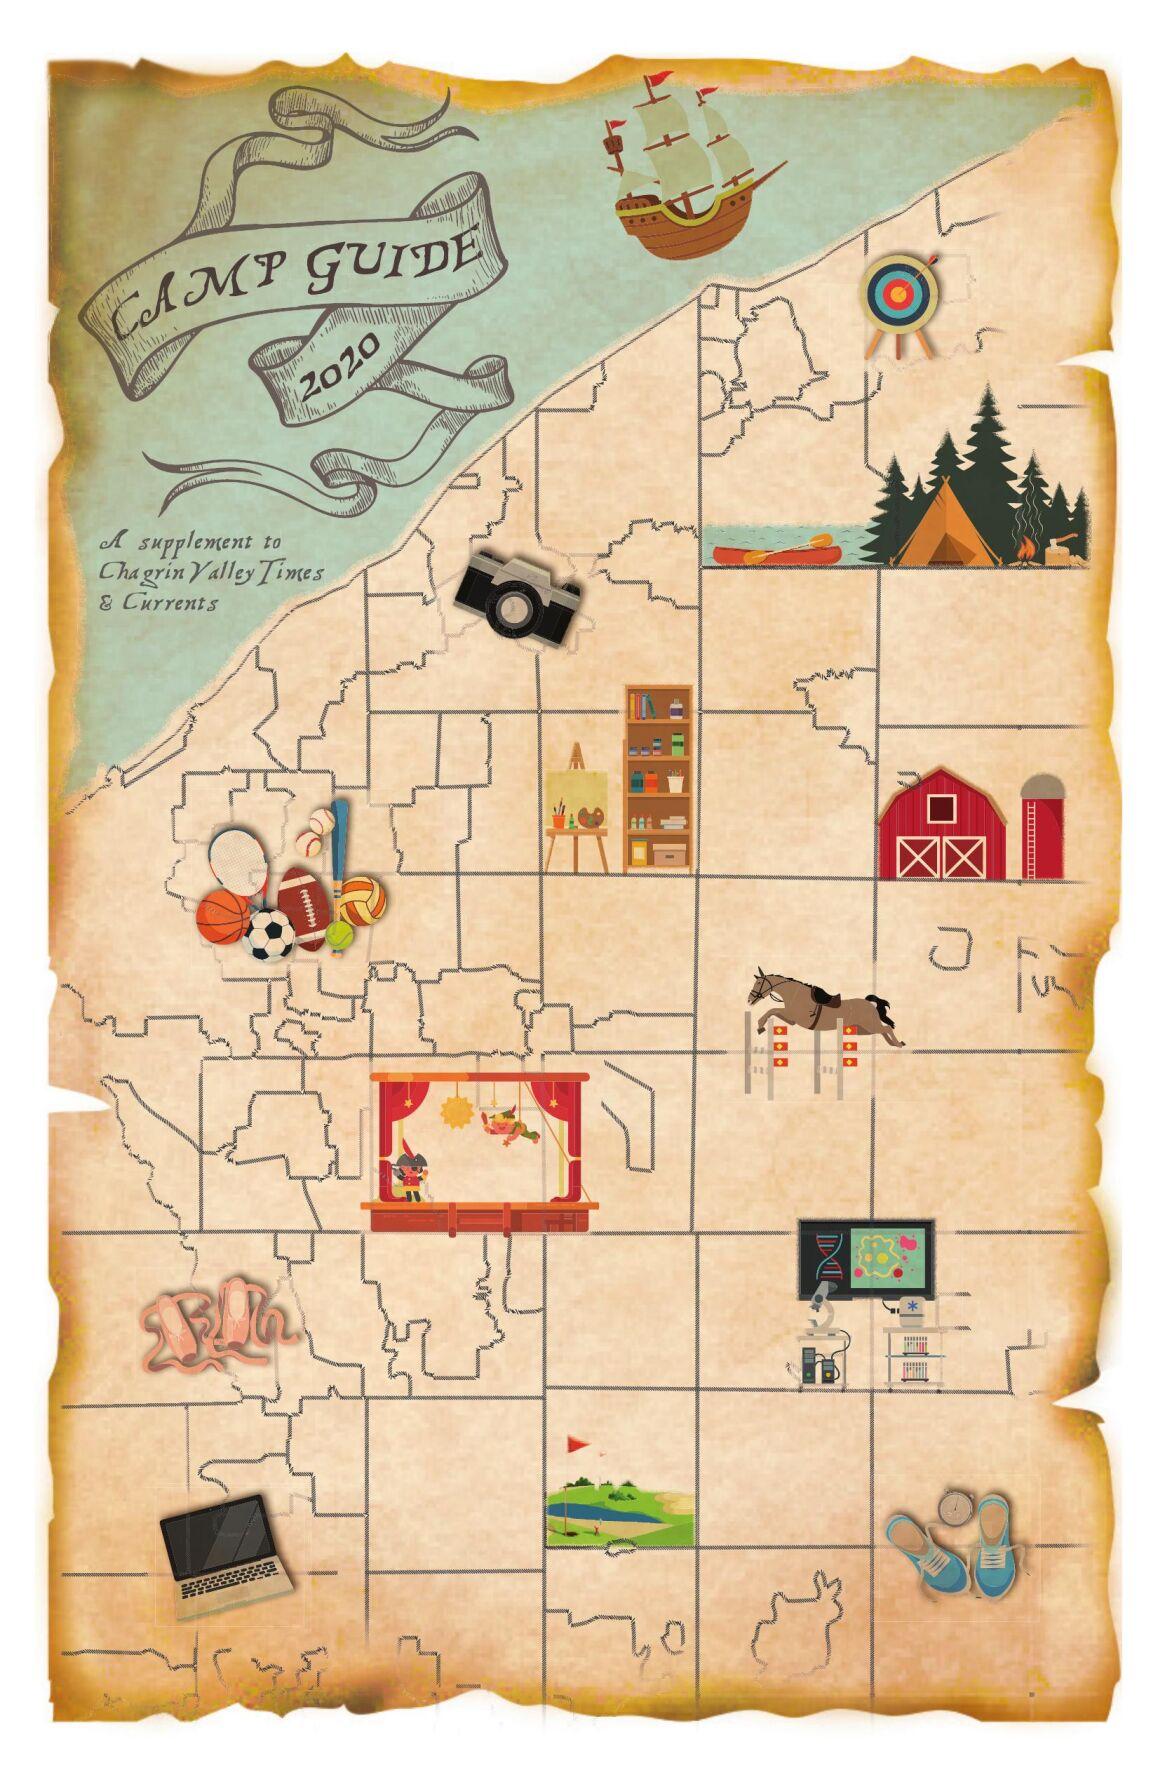 Camp Guide 2020